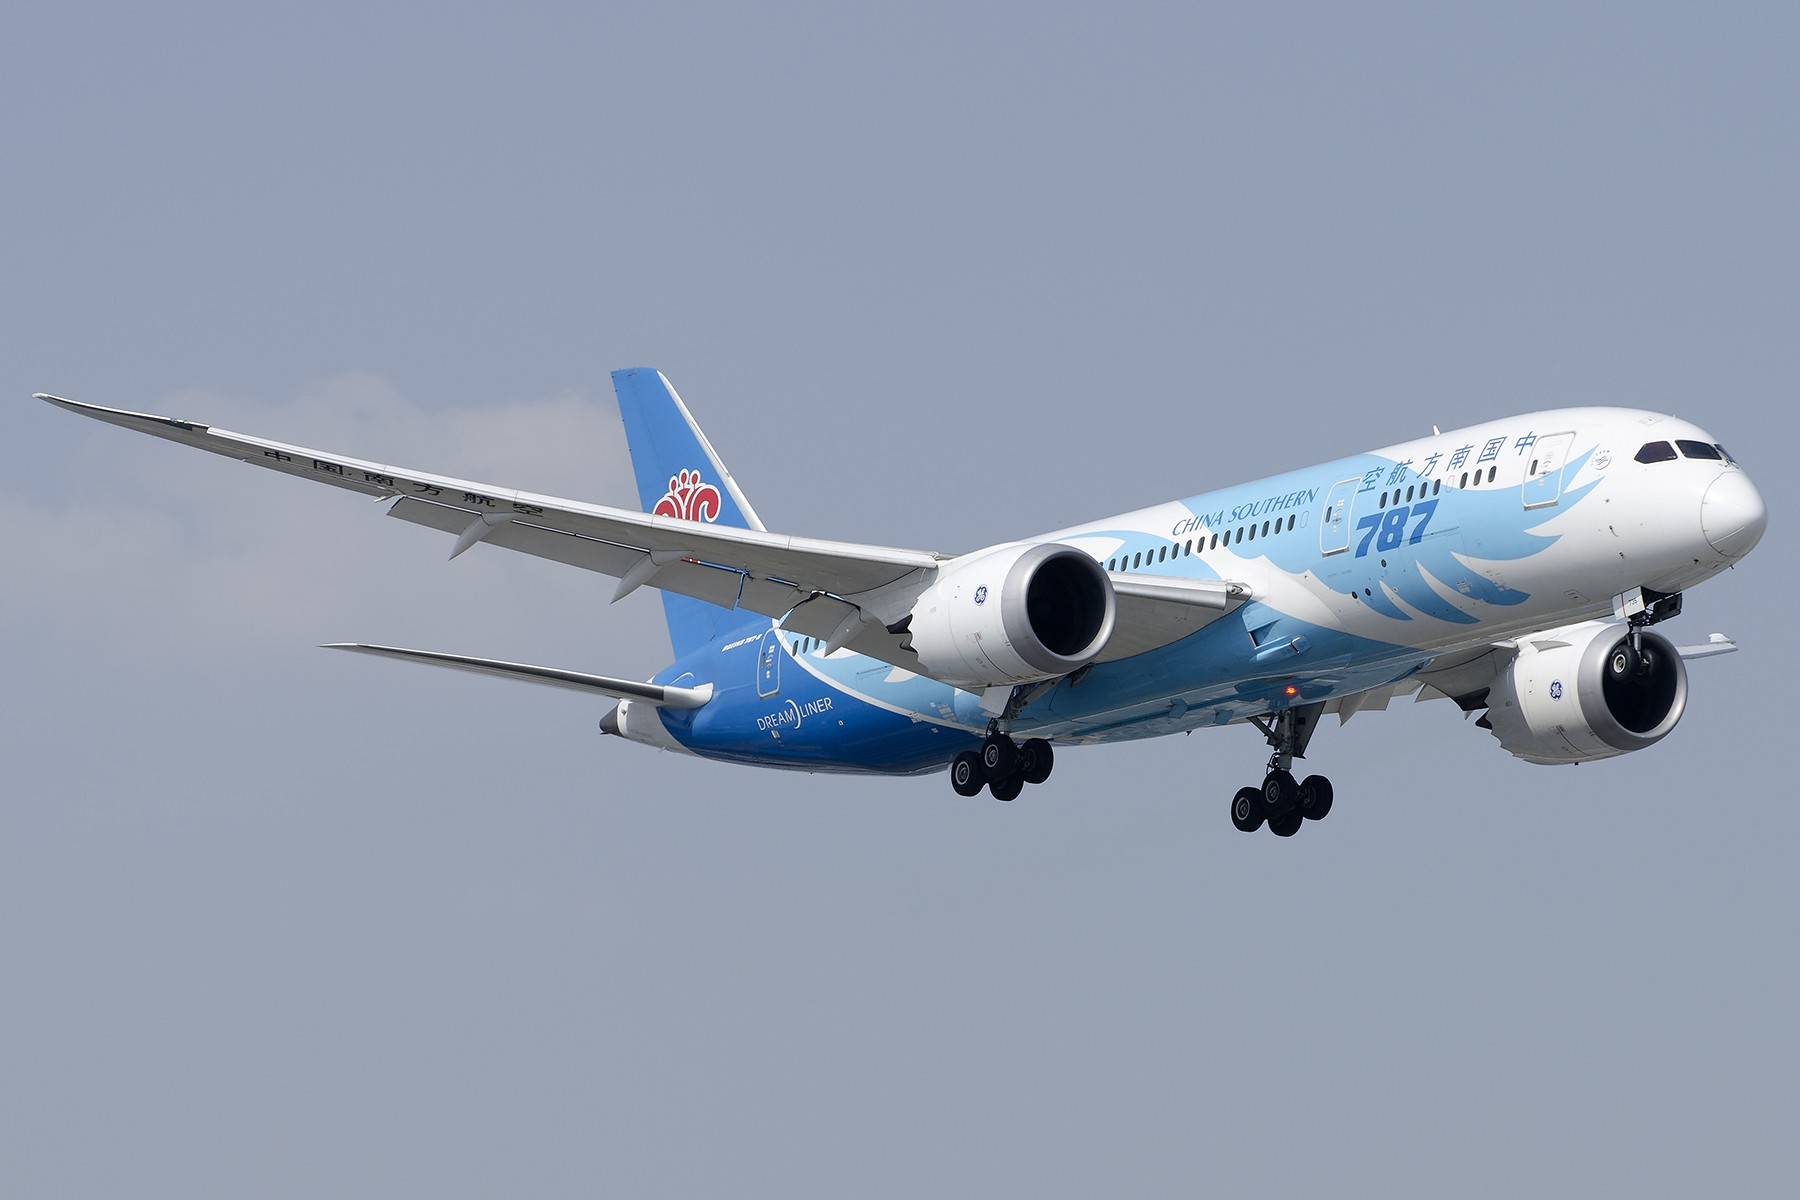 Re:[原创][原创]【SHA拍机*1800大图】4月拍的了,记得那天好货还挺多 BOEING 787-8 B-2735 中国上海虹桥国际机场